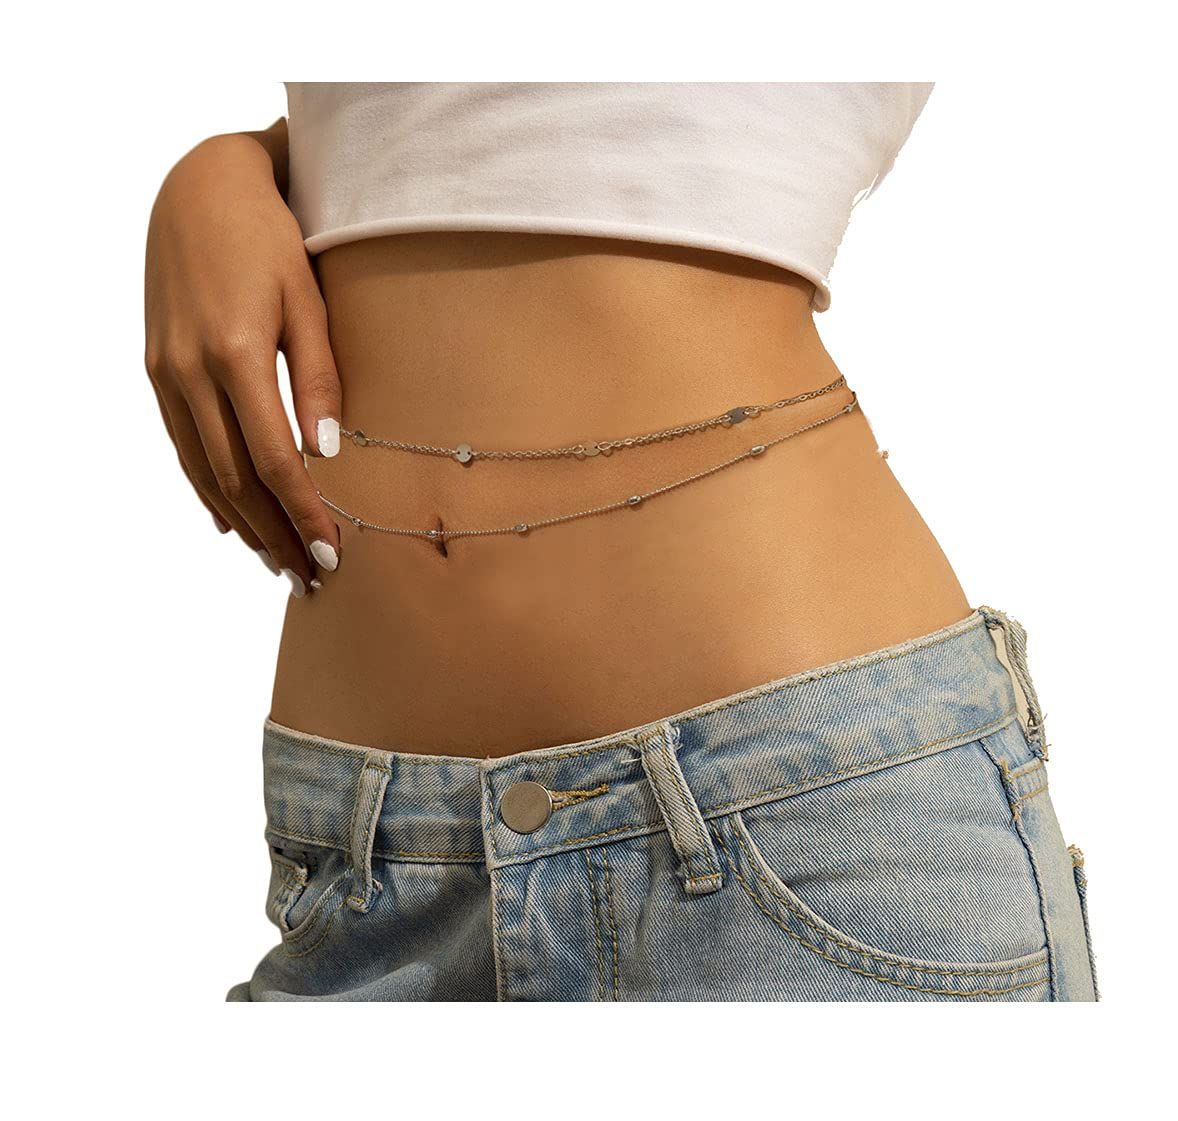 2pcs Women Sexy Belly Waist Chain Beads Sequin Body Chain Summer Bikini Body Jewelry(Golden)